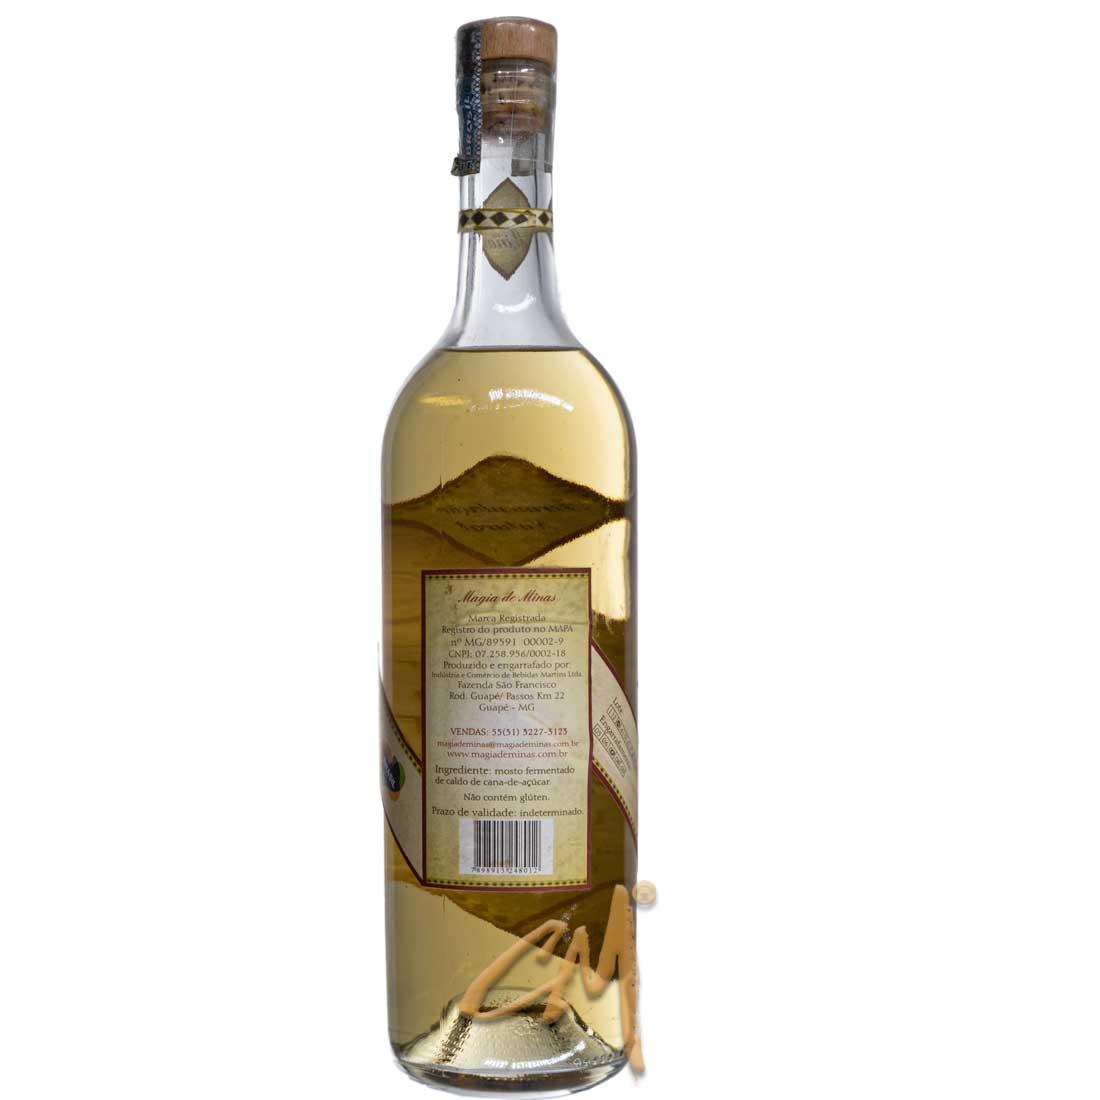 Cachaça Pura Magia Ouro 750 ml - Antiga - (Guapé - MG)